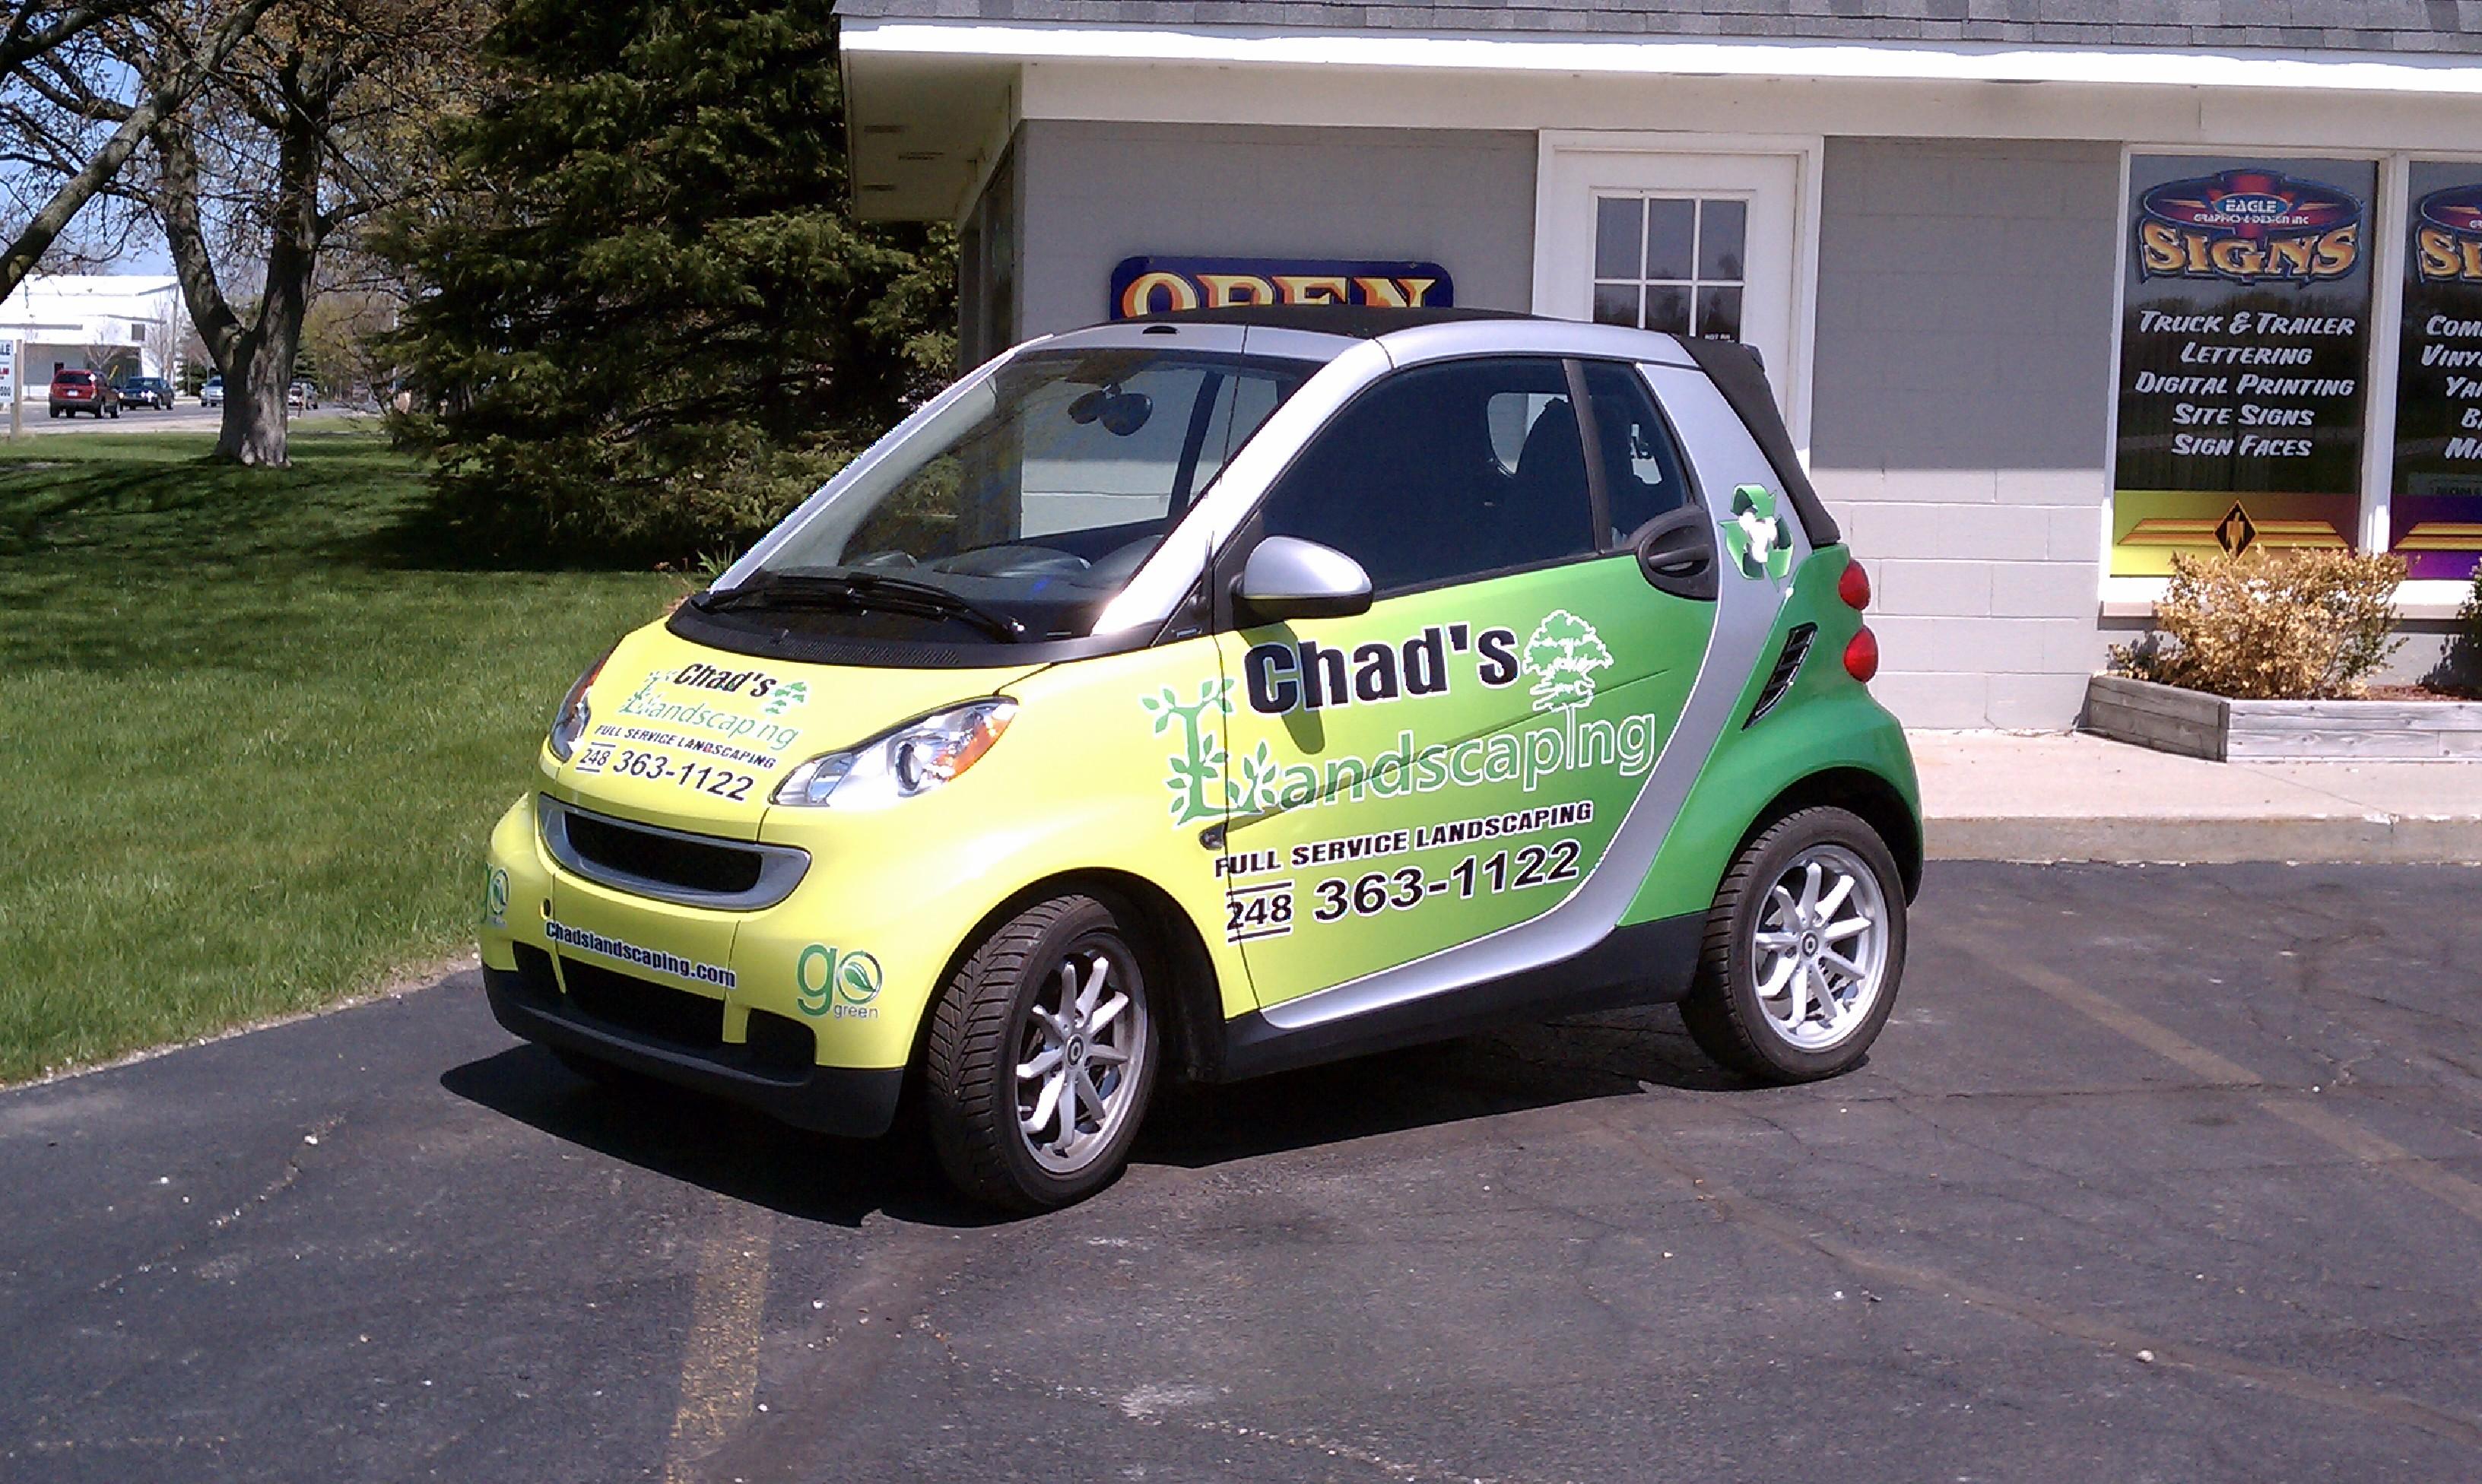 Chads Smart Car wrap vinyl wrap